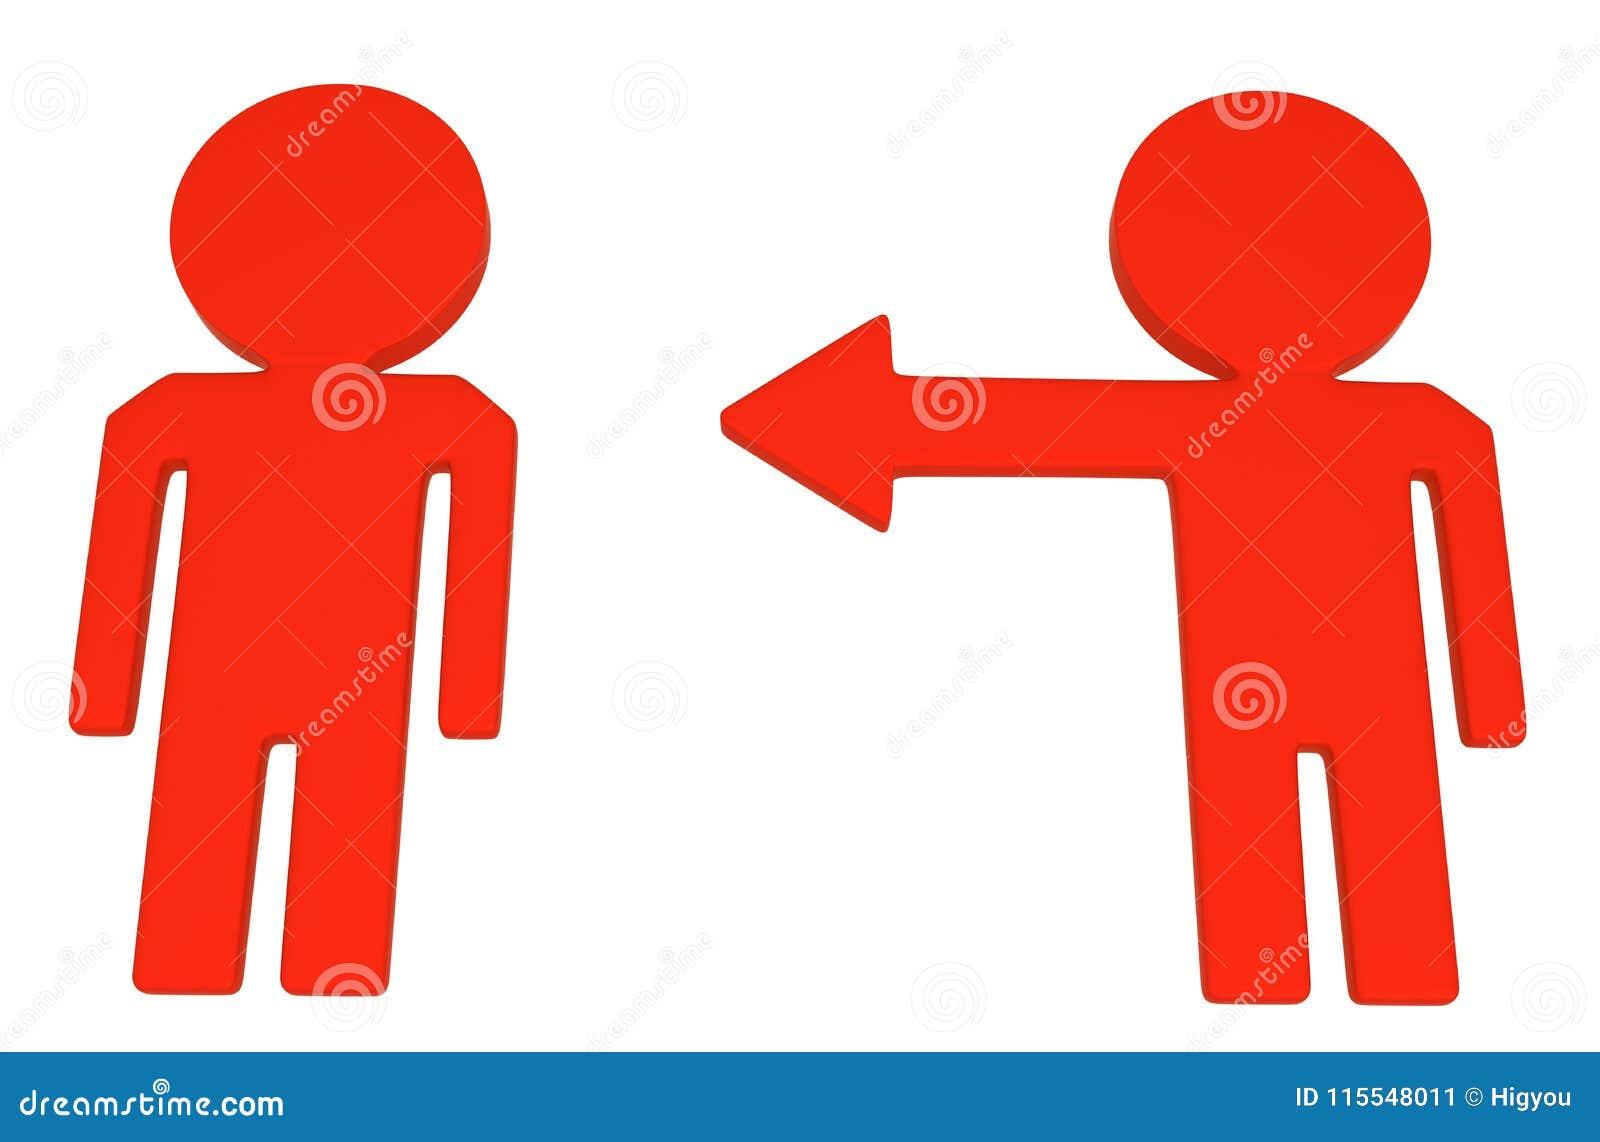 arrow arm figure point stock illustration illustration of direction